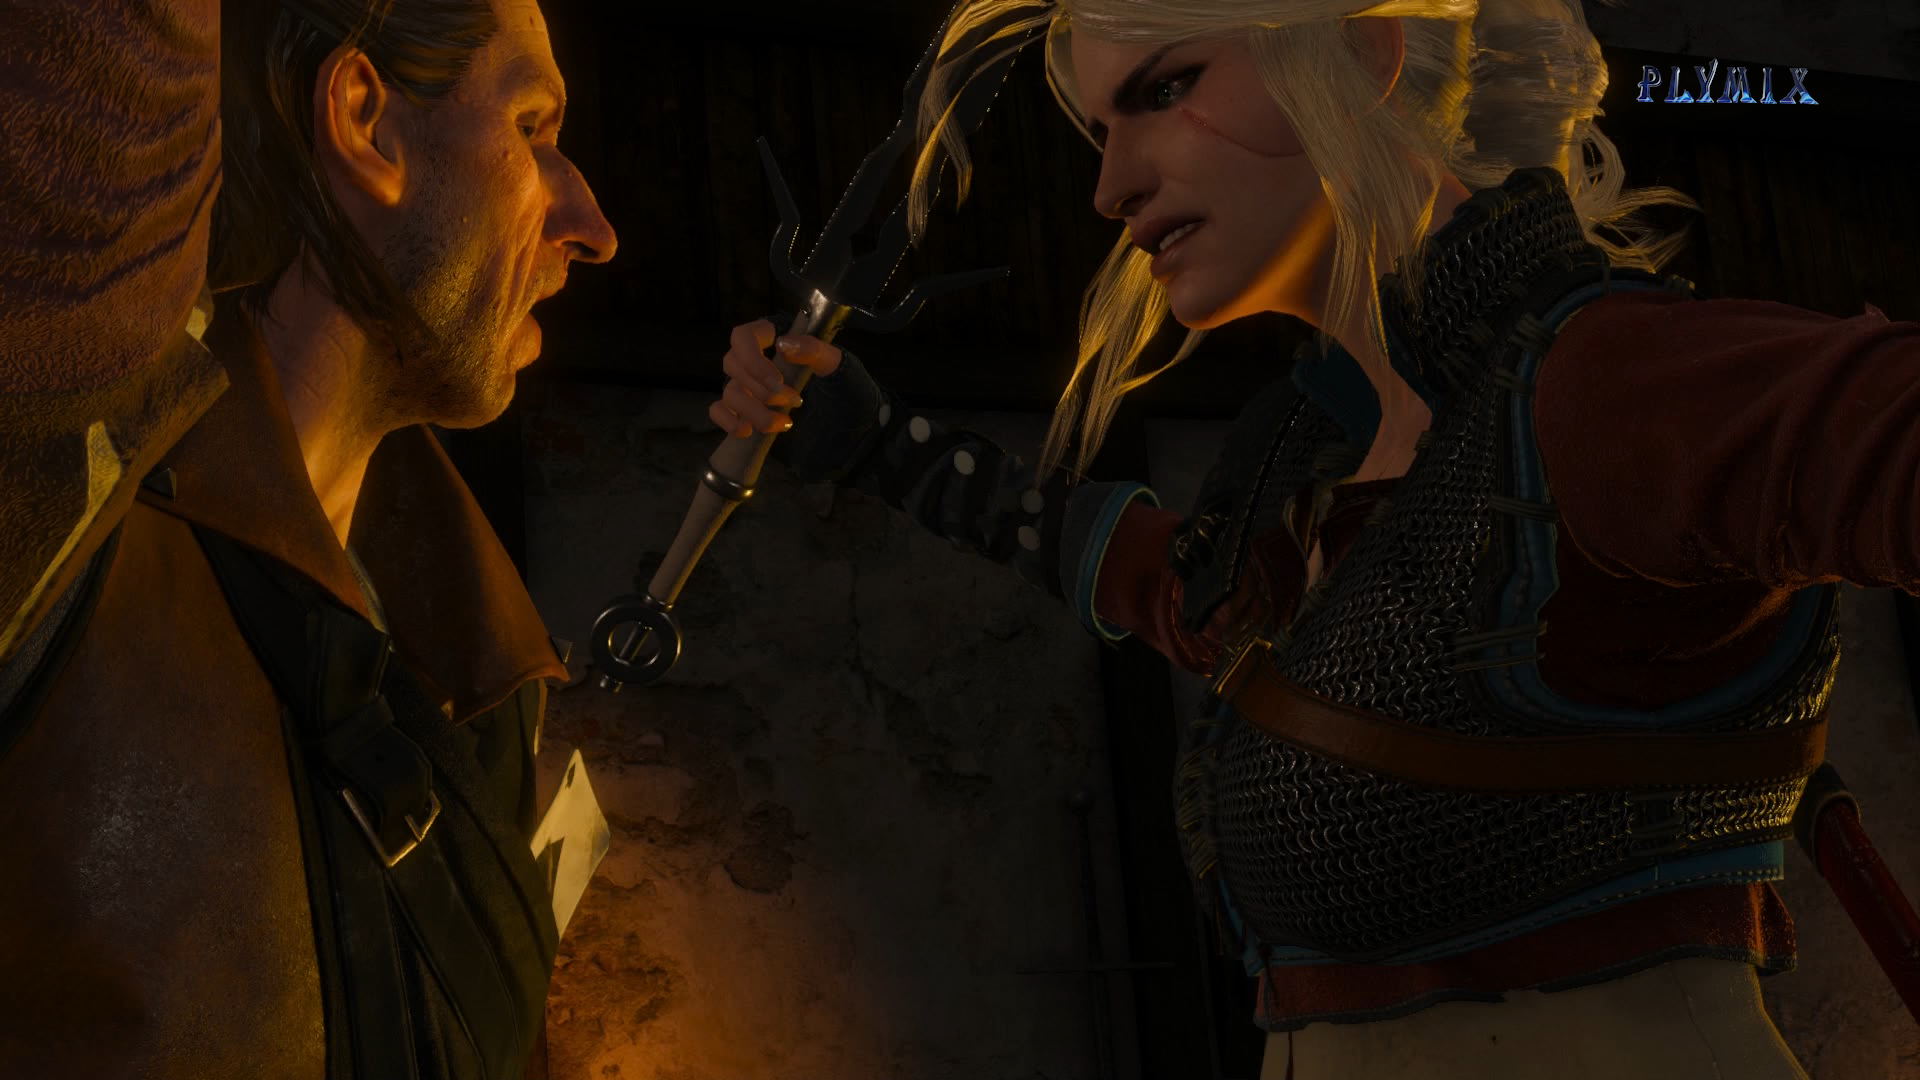 14 ублюдок.png - Witcher 3: Wild Hunt, the